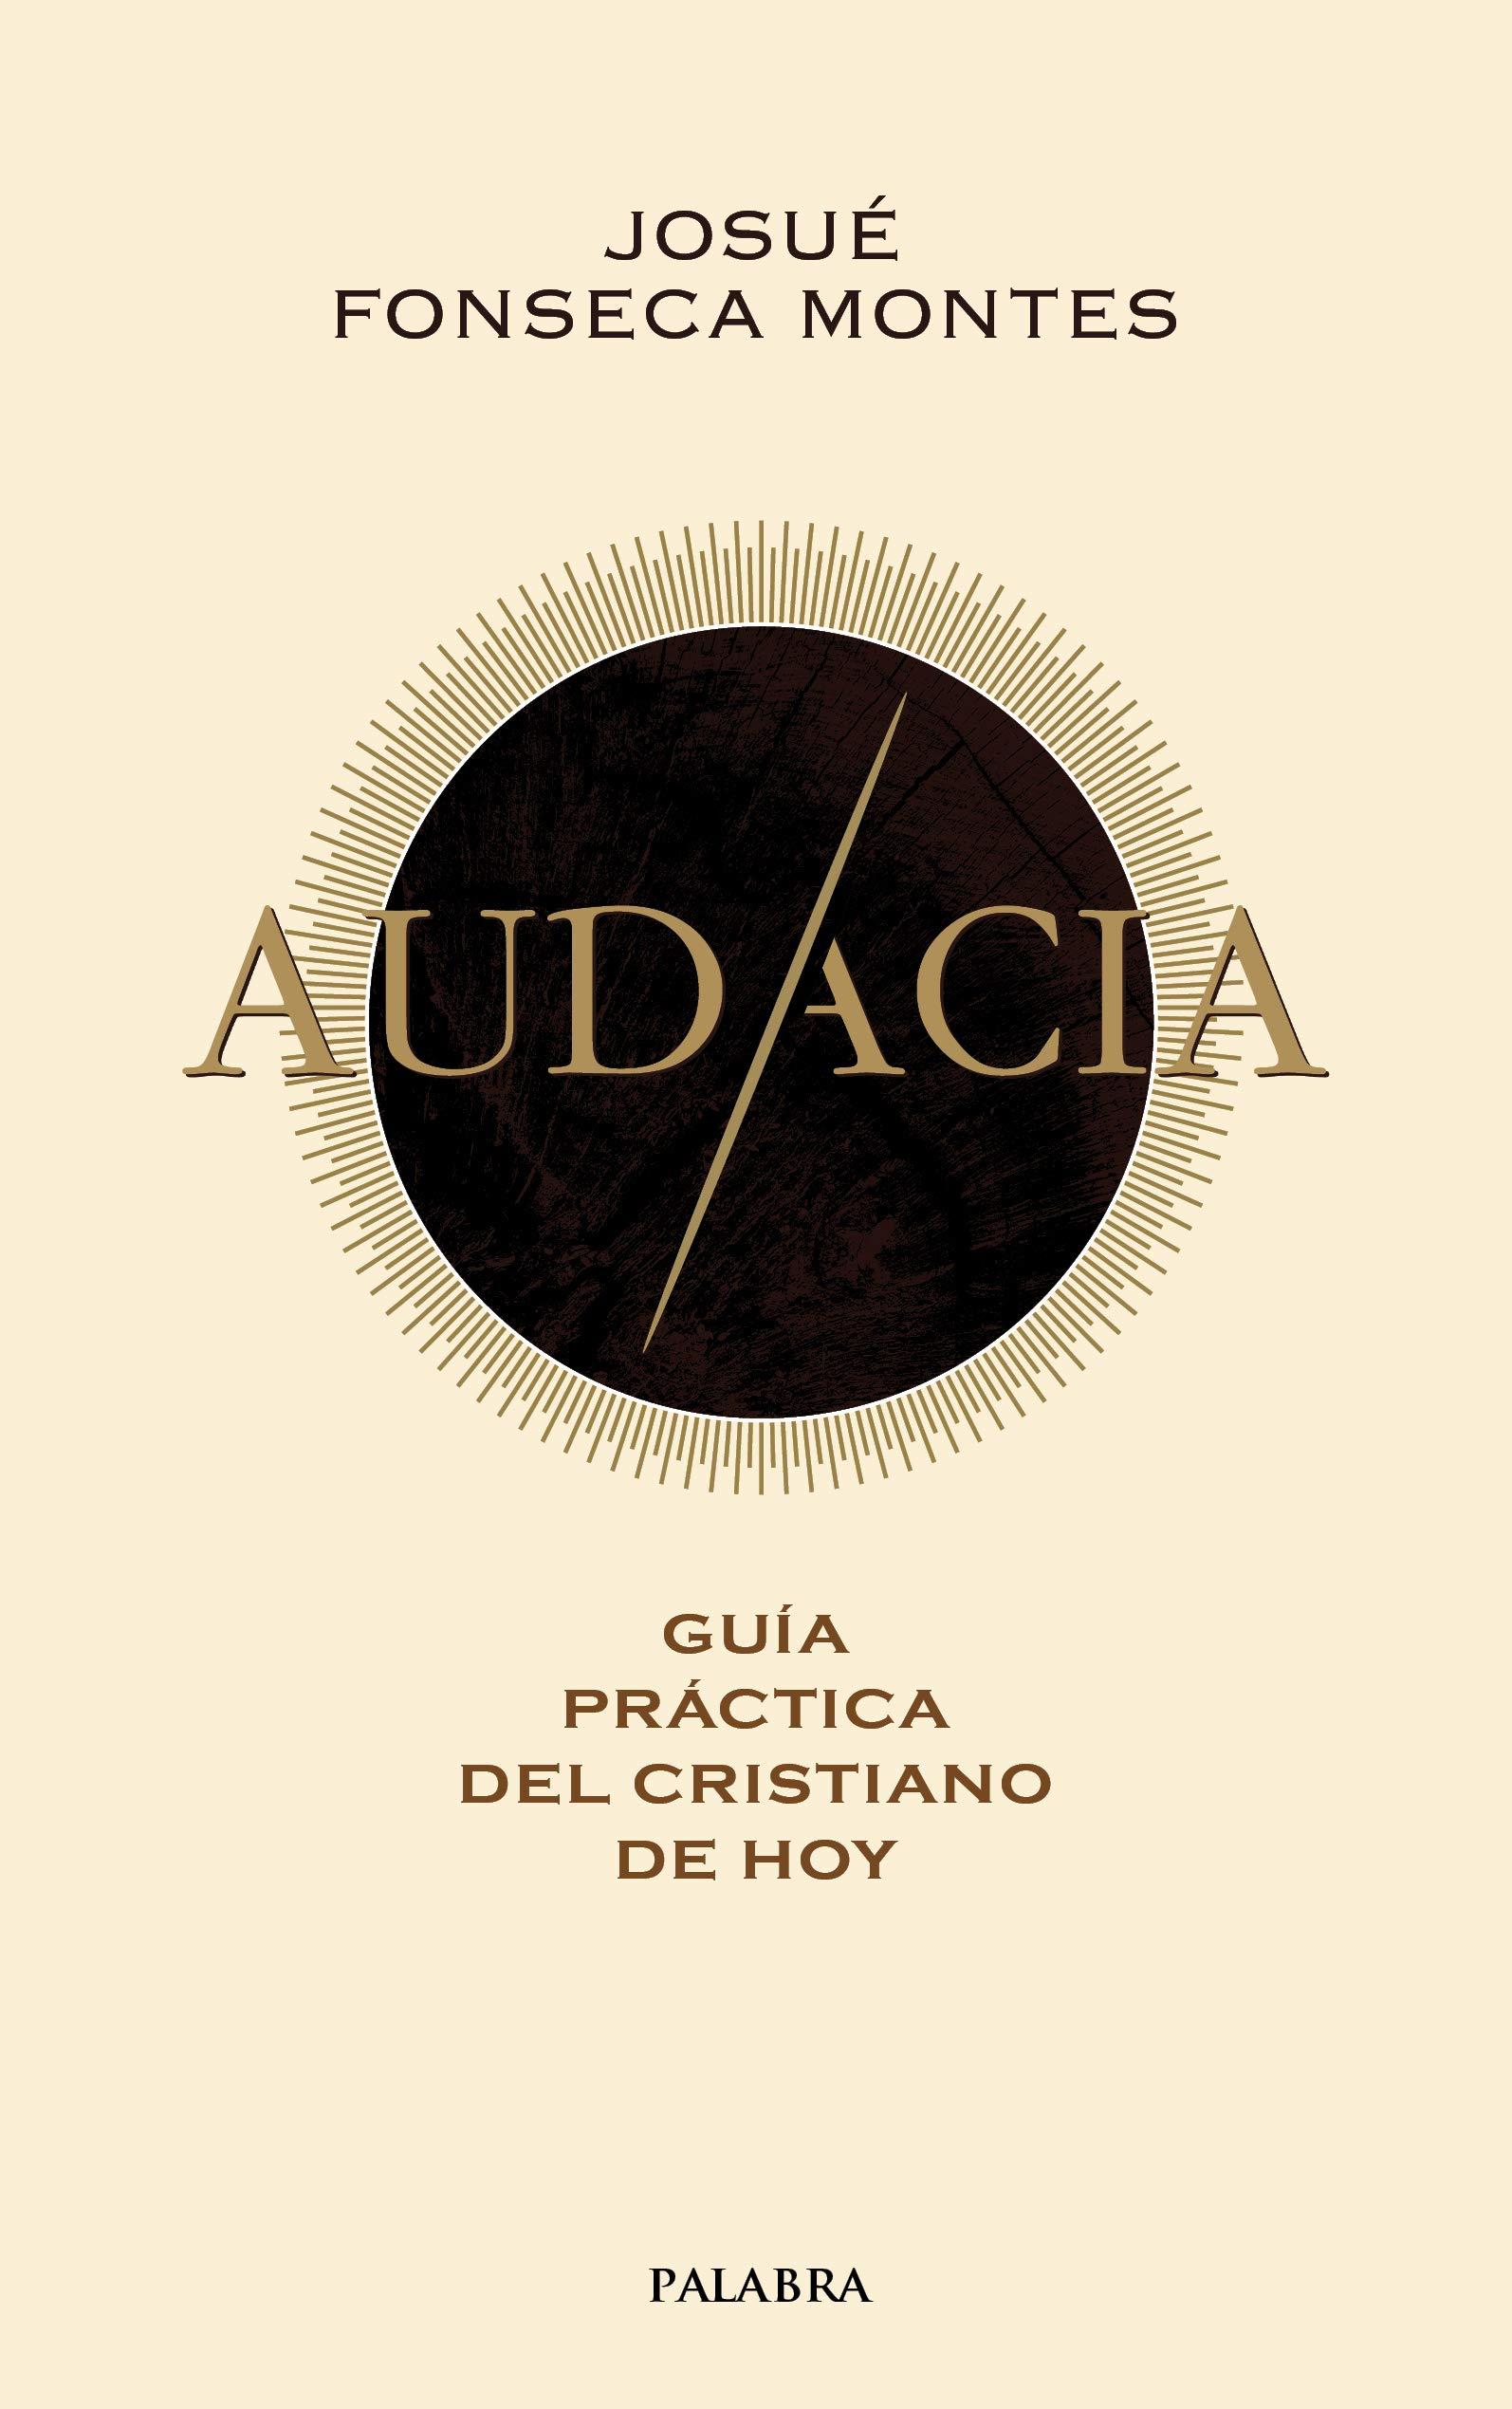 Guía práctica del cristiano de hoy: Amazon.es: Josué Fonseca Montes, Raúl Ostos: Libros